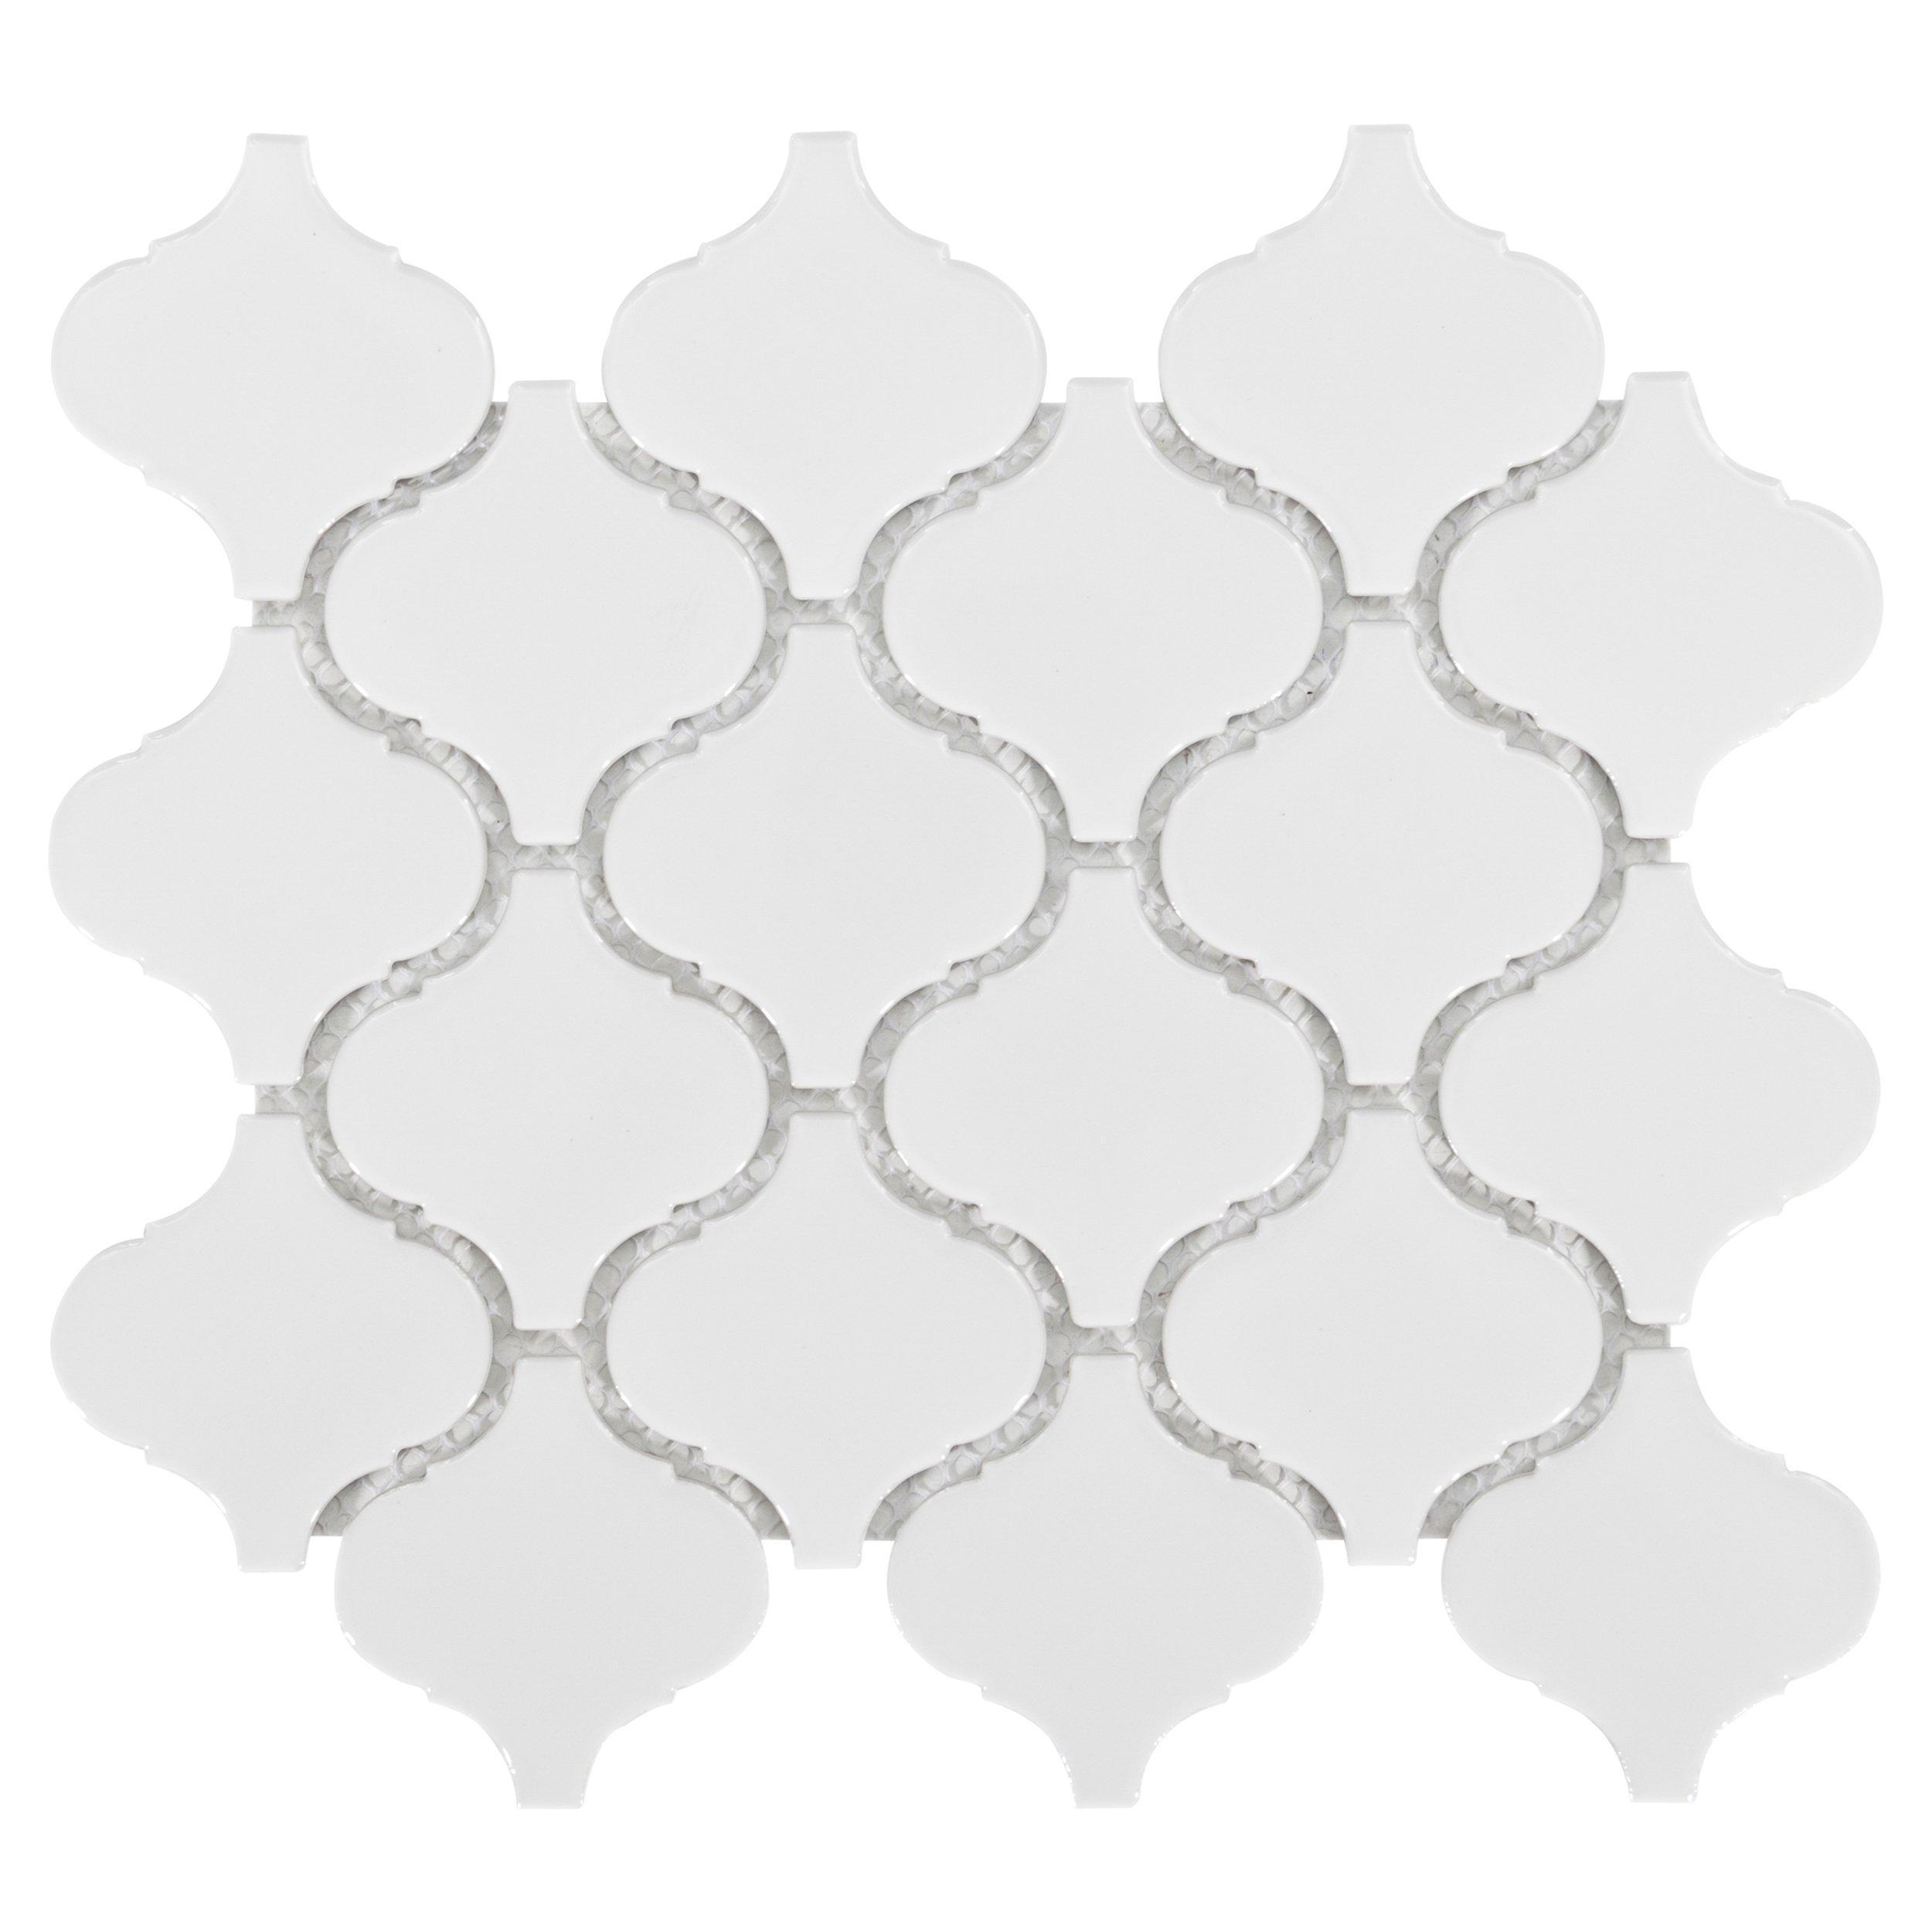 arabesque lantern white porcelain mosaic 10in x 11in floor and decor